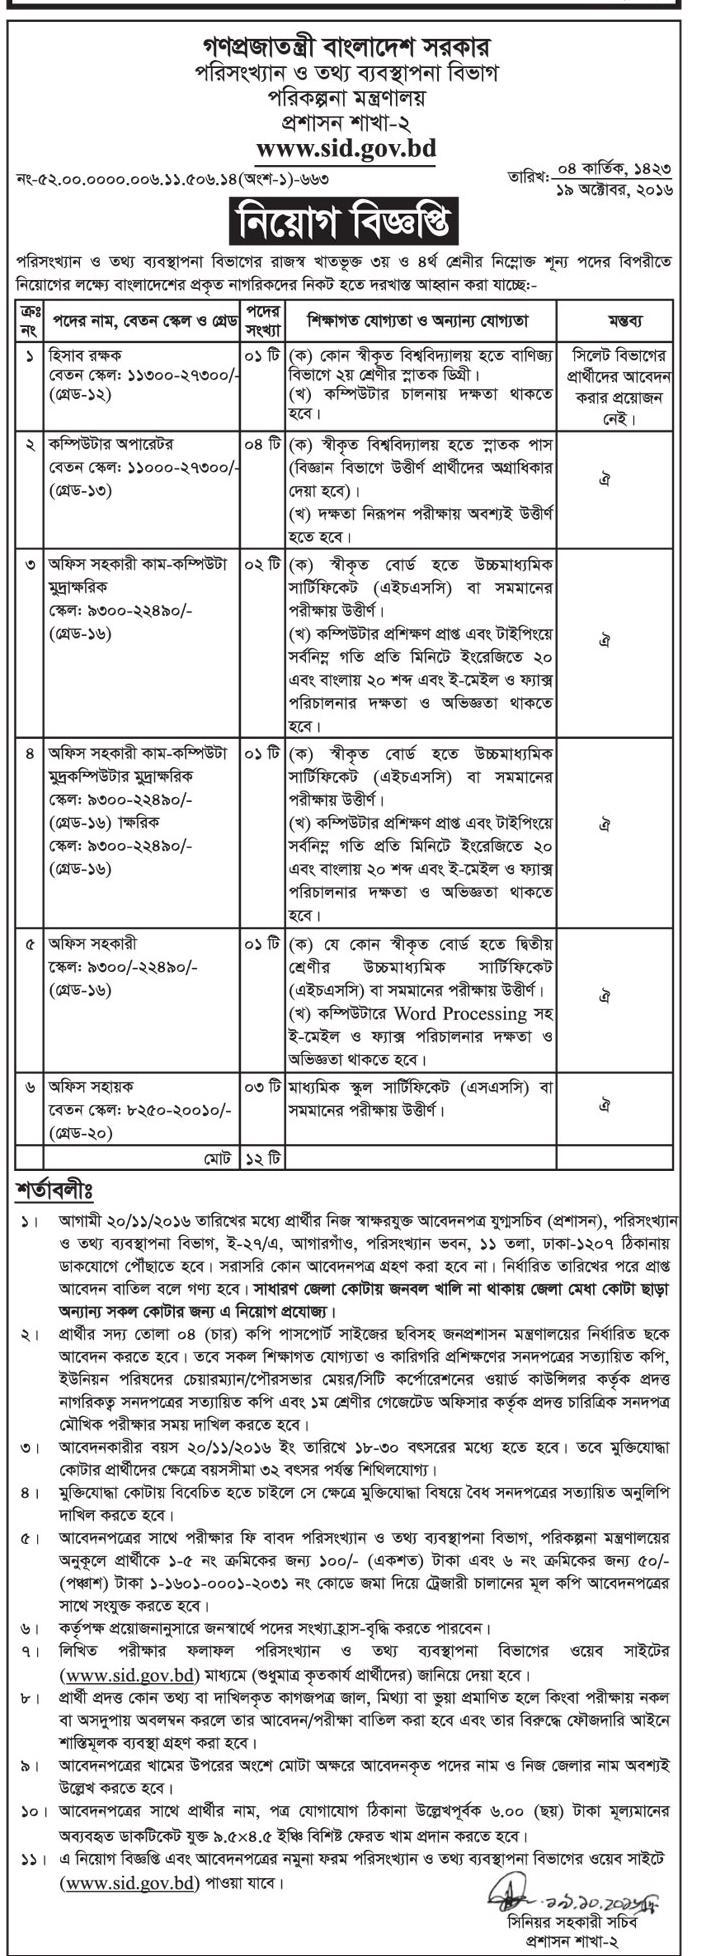 Statistics and Informatics Division (SID) Government Job Circular 2016